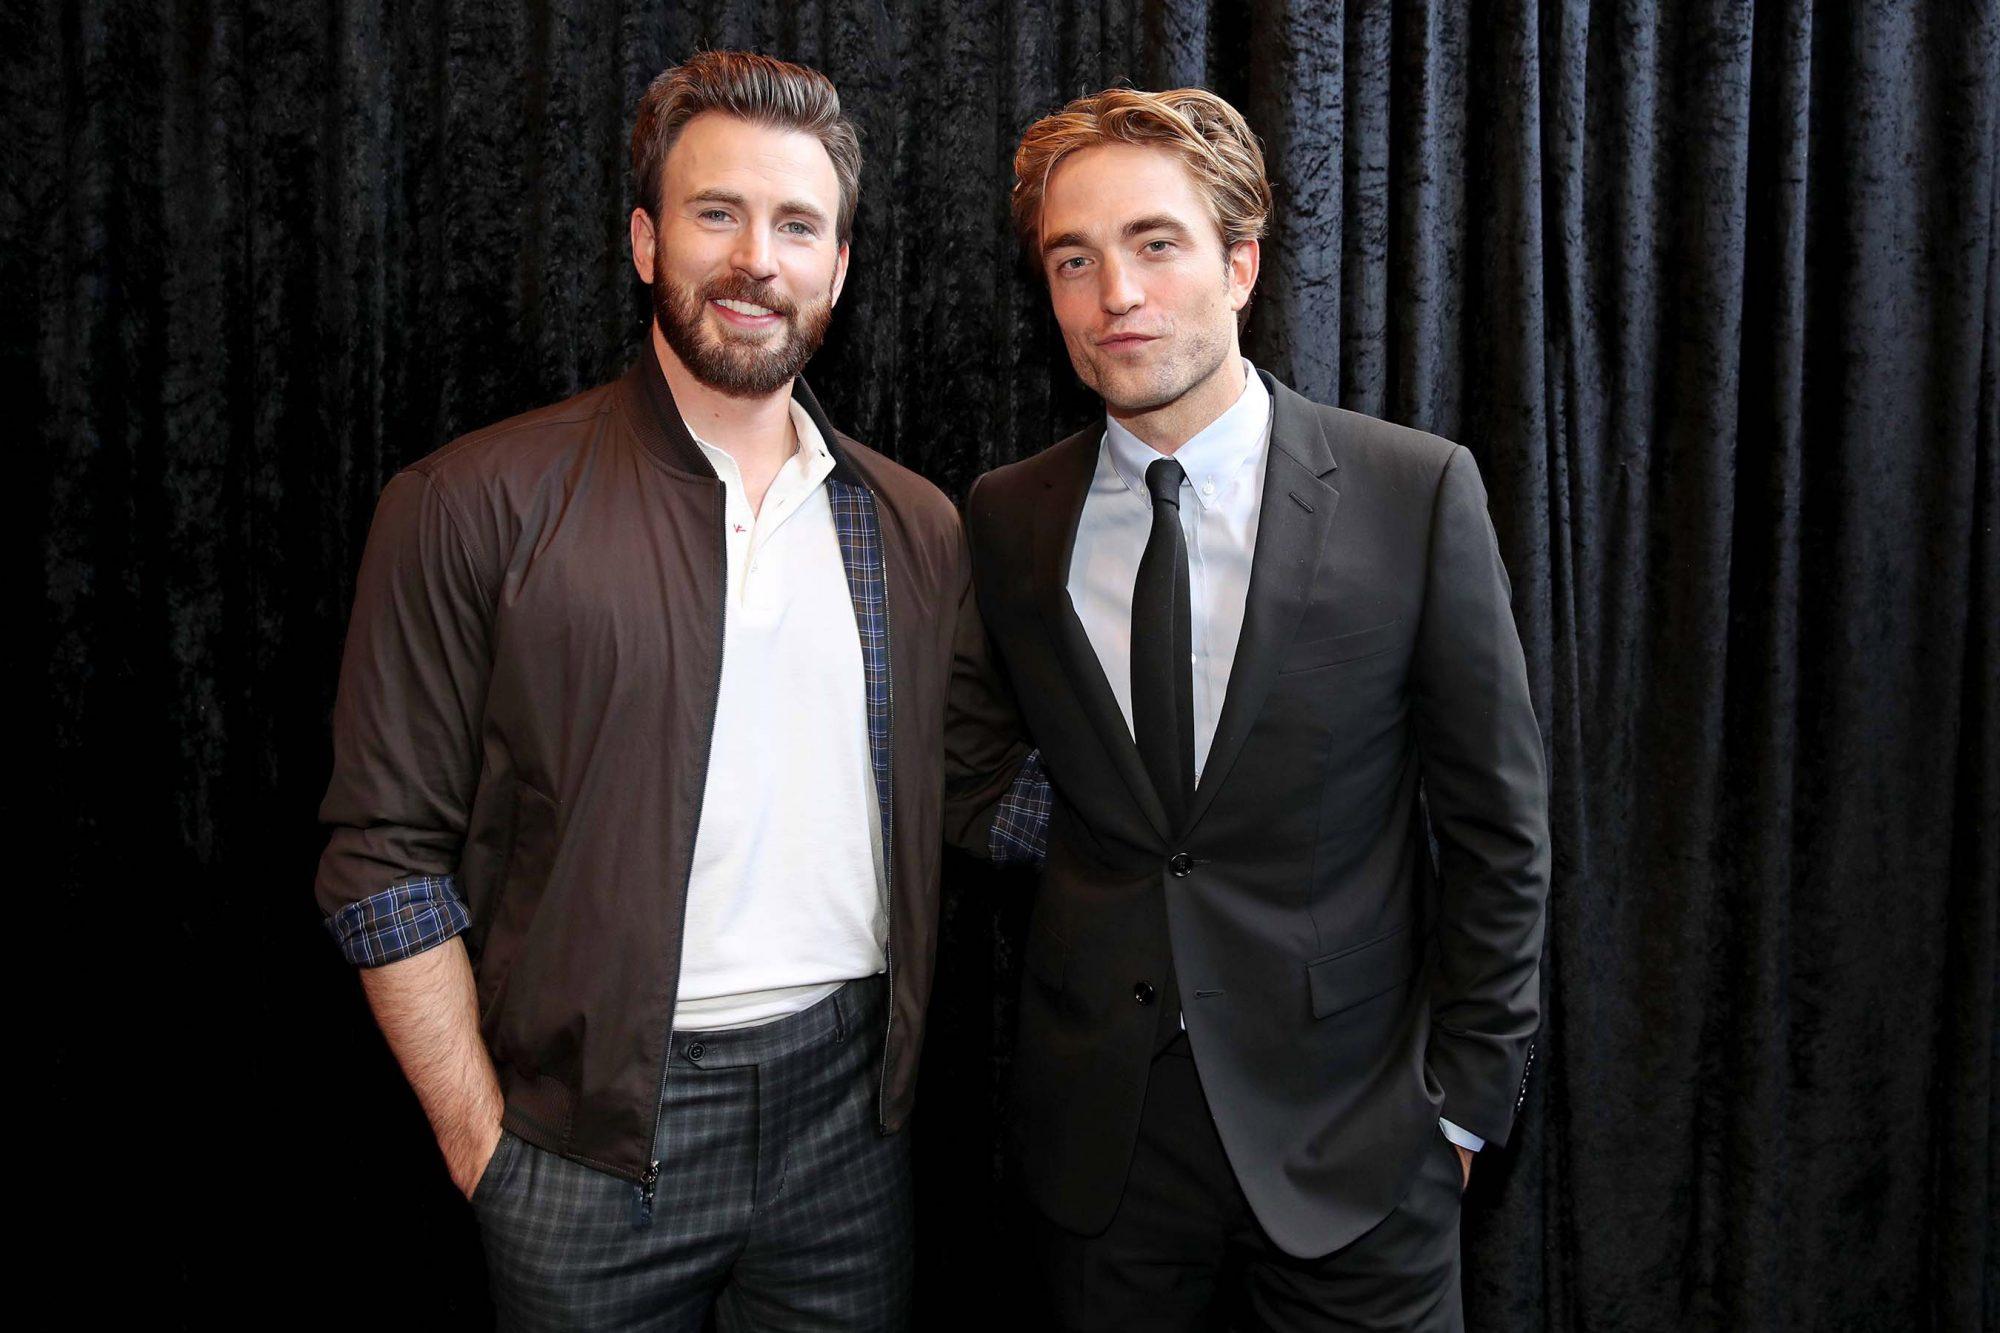 Chris Evans and Robert Pattinson